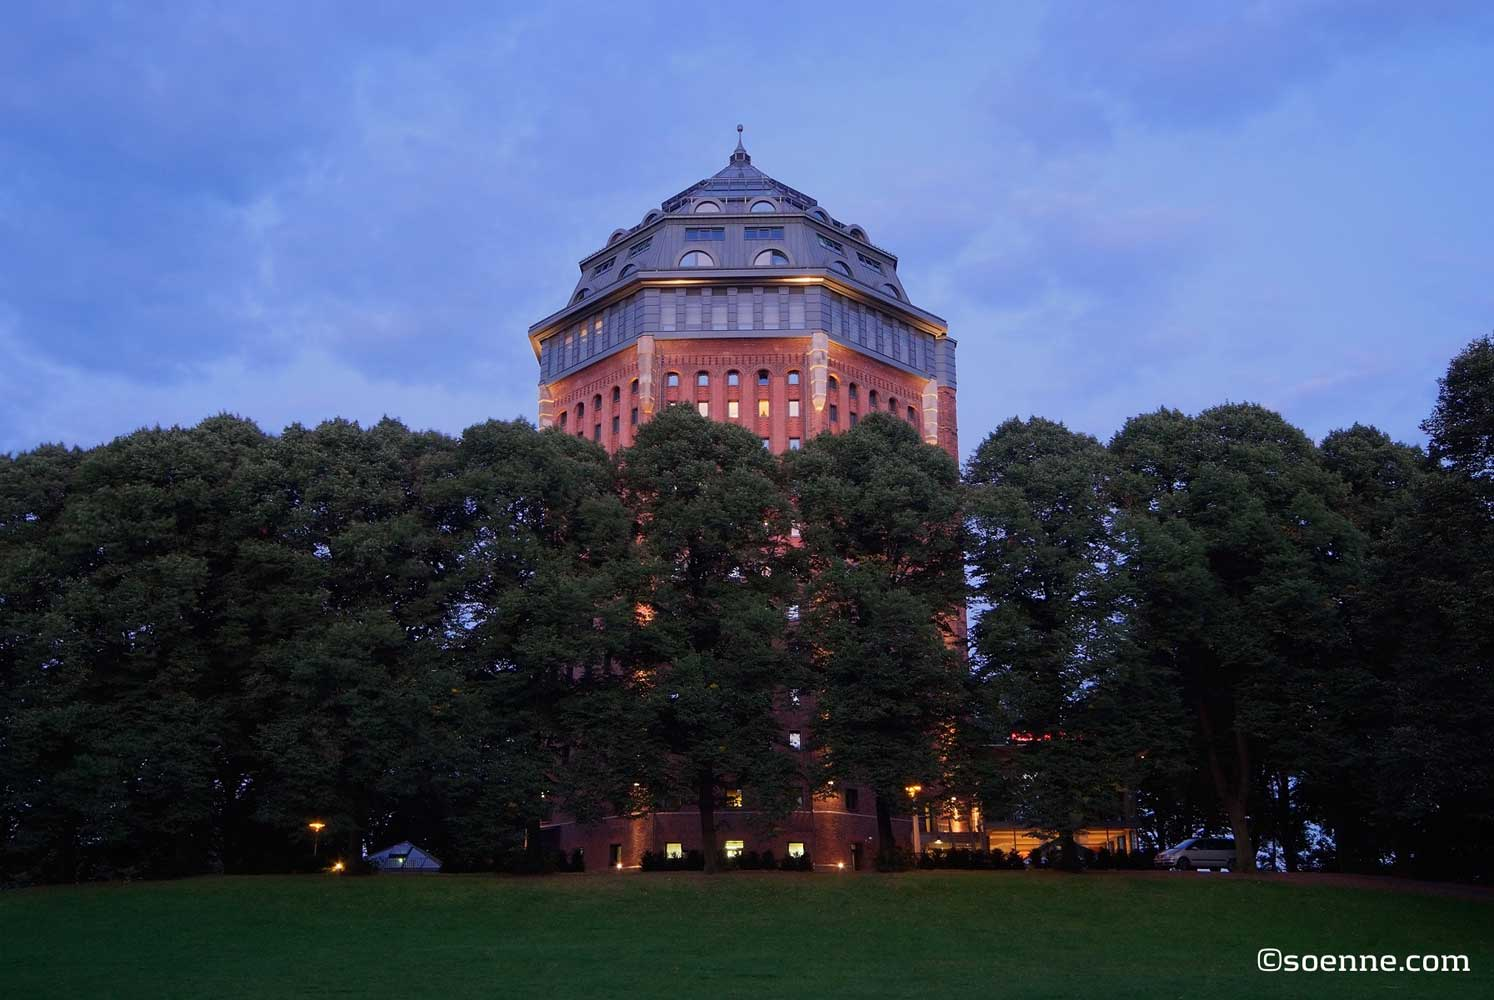 Hamburg: Moevenpick Wasserturm | Soenne Hotelfotografie